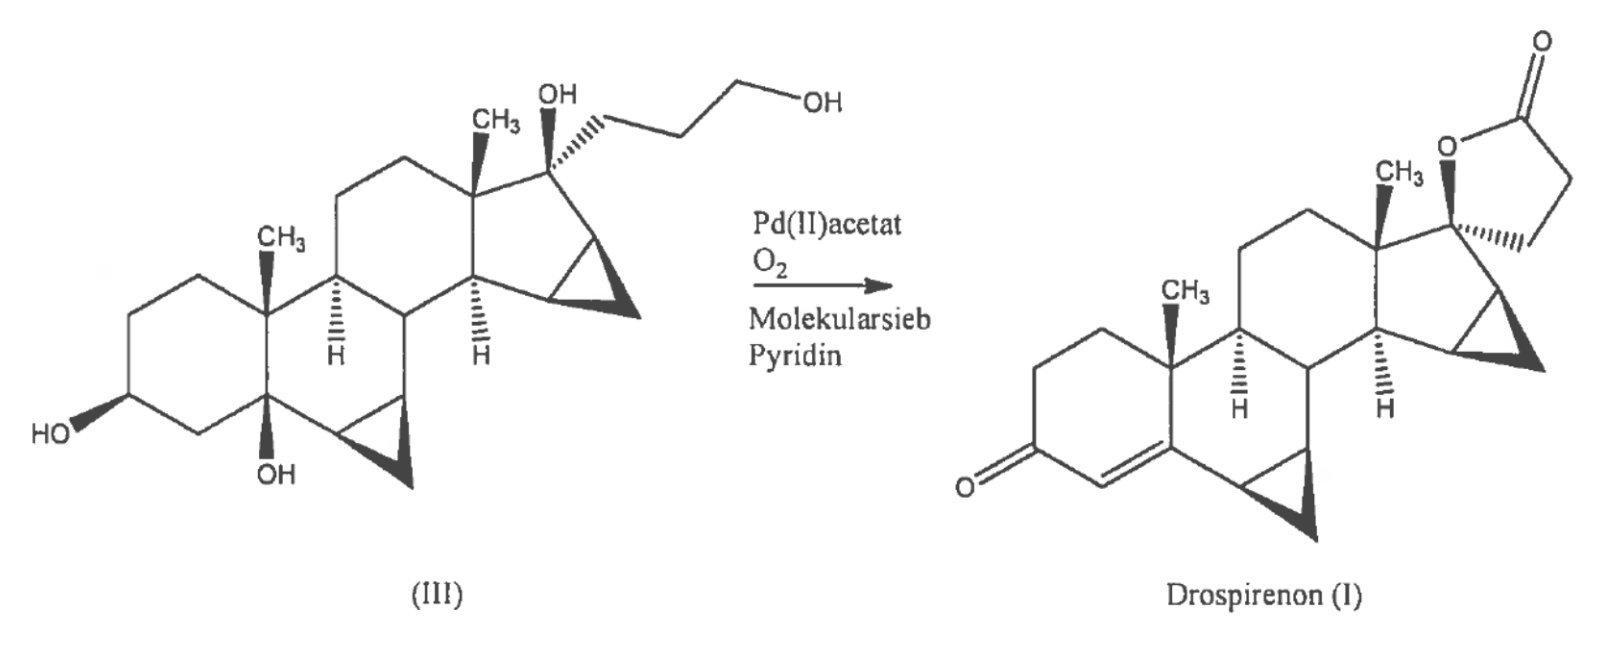 Palladium-catalyzed one-step synthesis of drospirenone